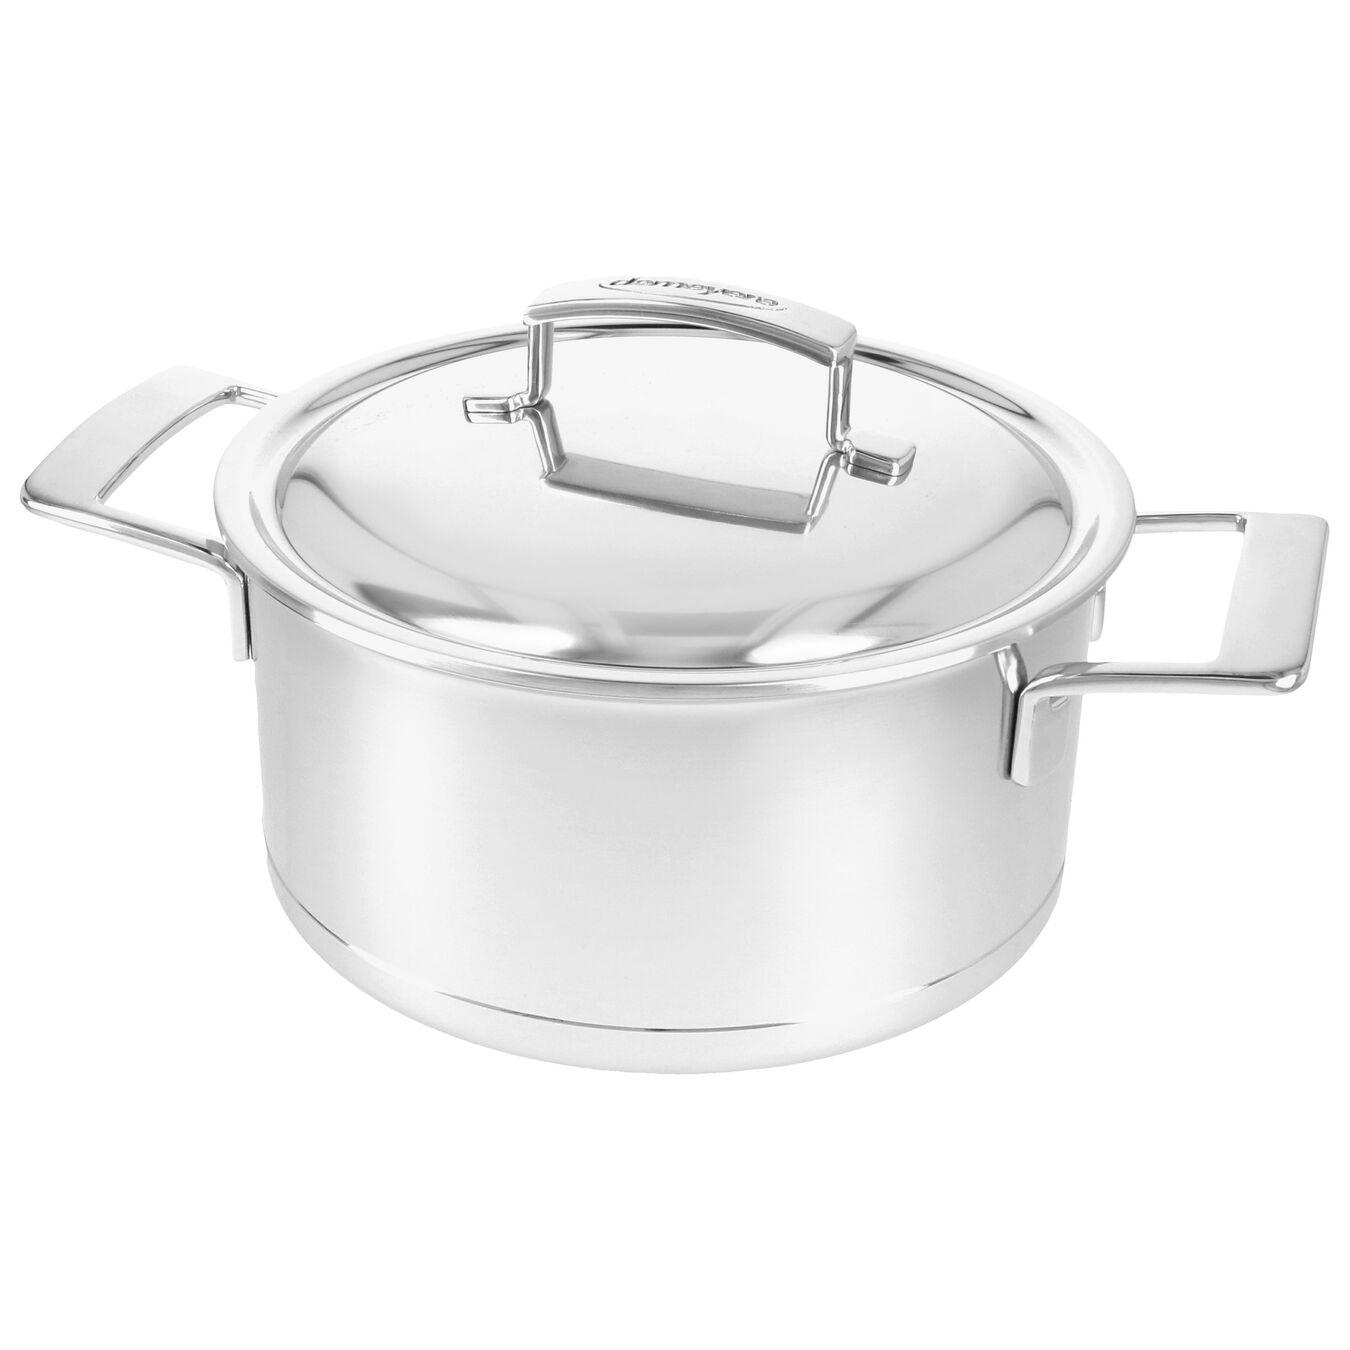 Kookpot met dubbelwandig deksel 22 cm / 4 l,,large 2